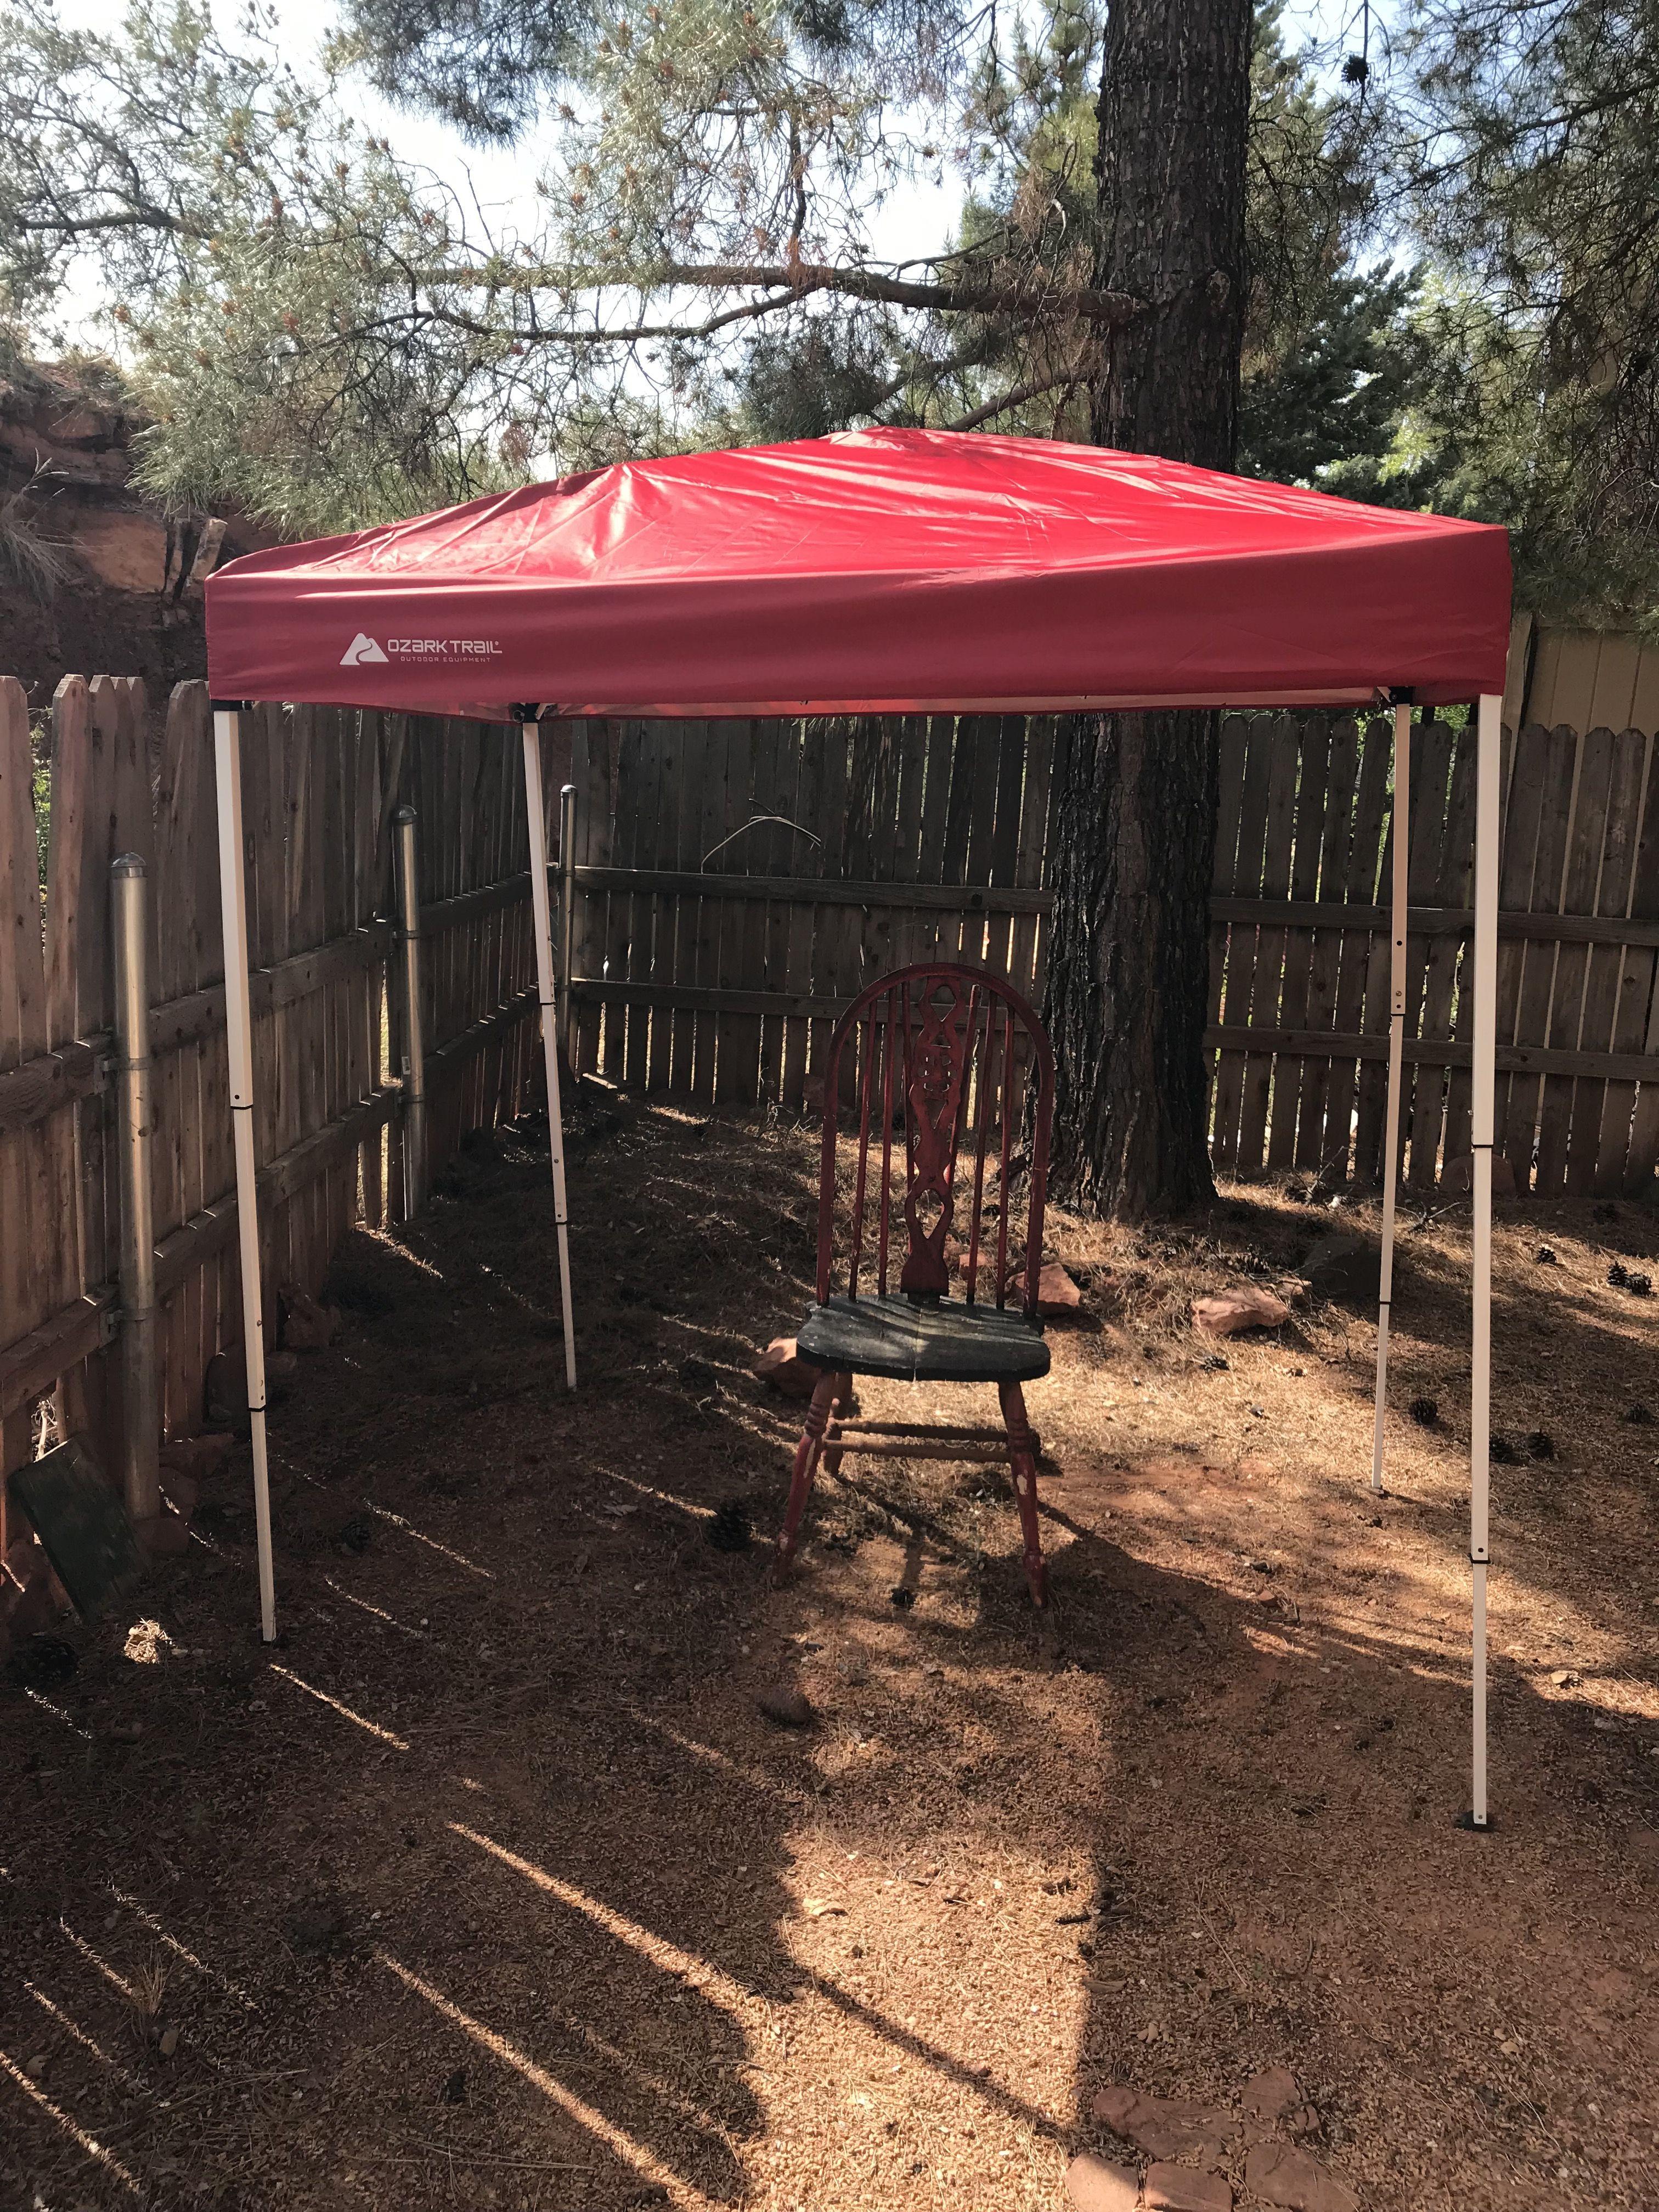 Ozark Trail 4x6 Canopy I Did A 2 Man Job With Just Me A Bit Of